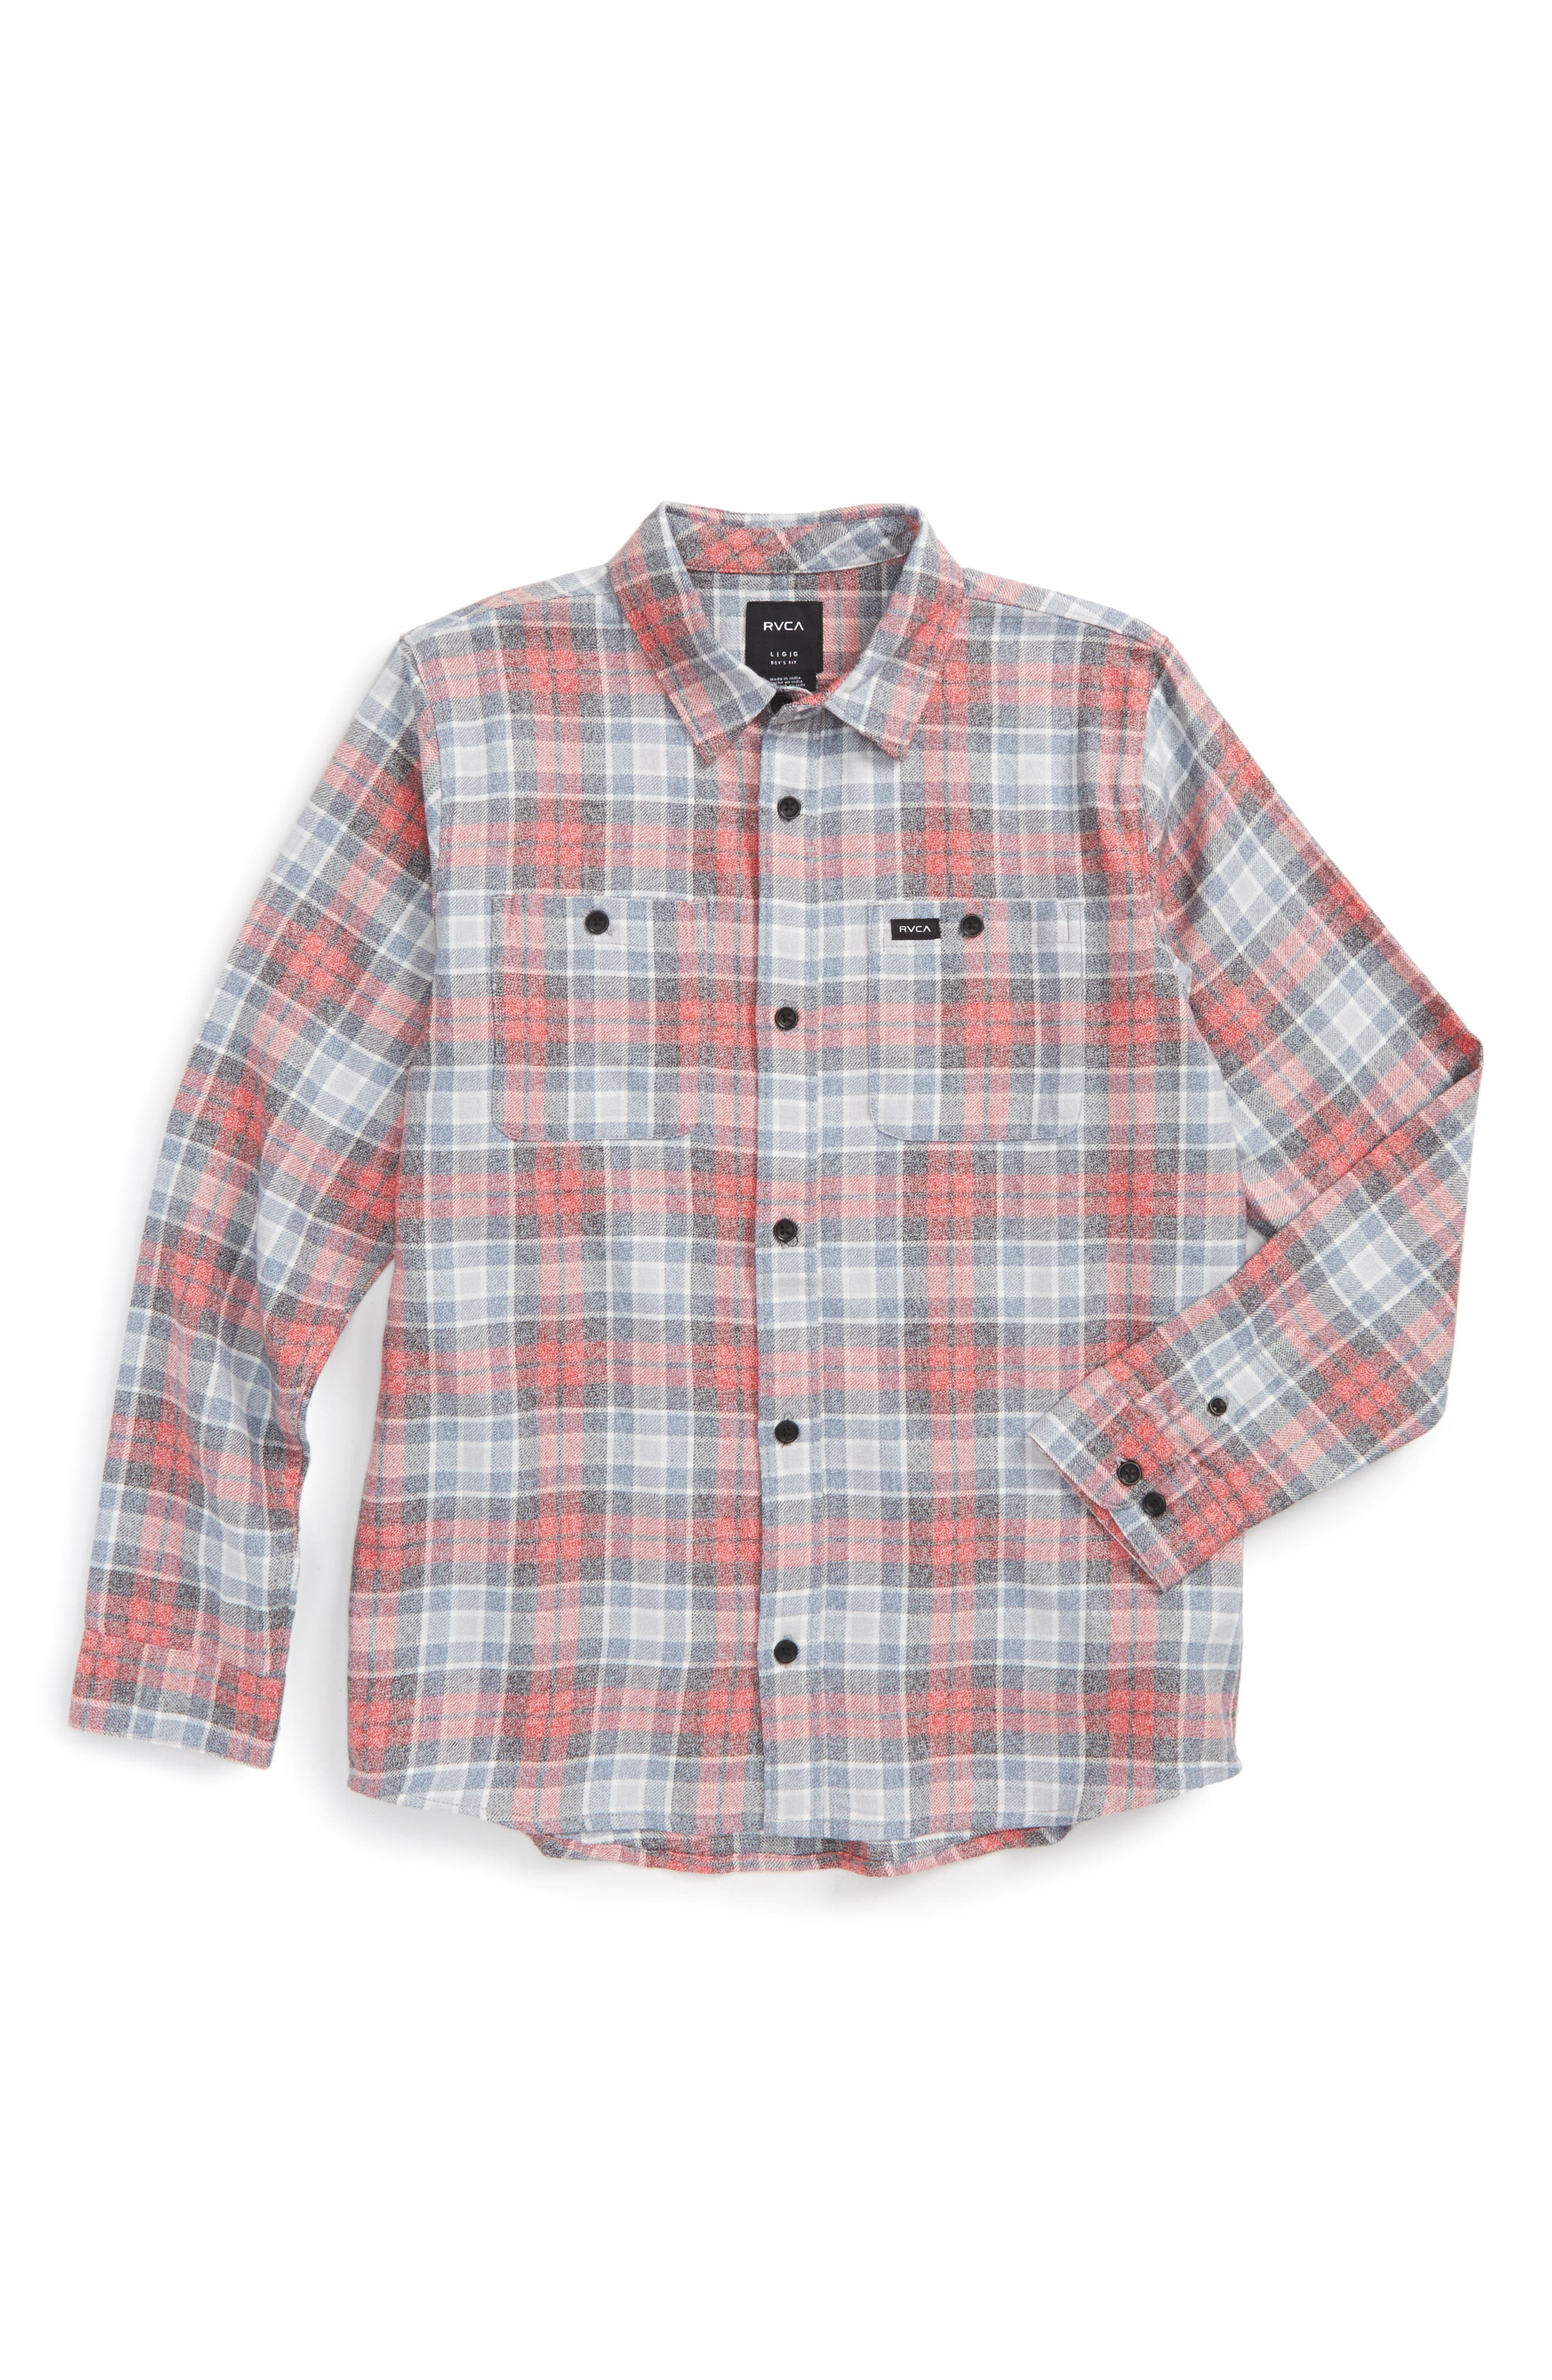 Diffusion Plaid Shirt,                         Main,                         color, Pirate Black